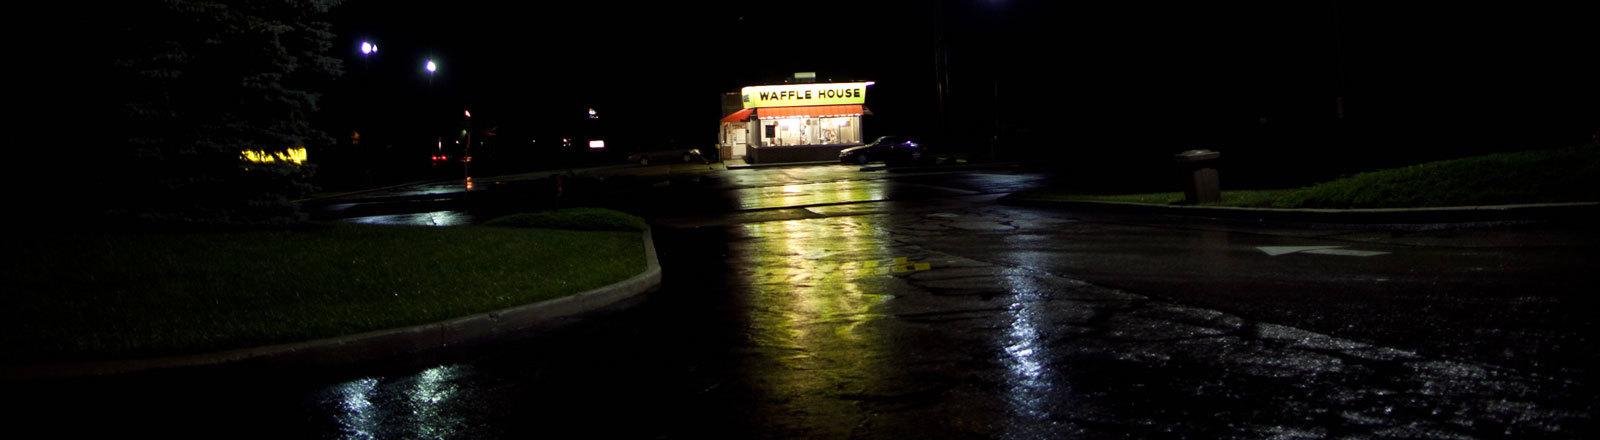 Eine Waffle-House-Filiale